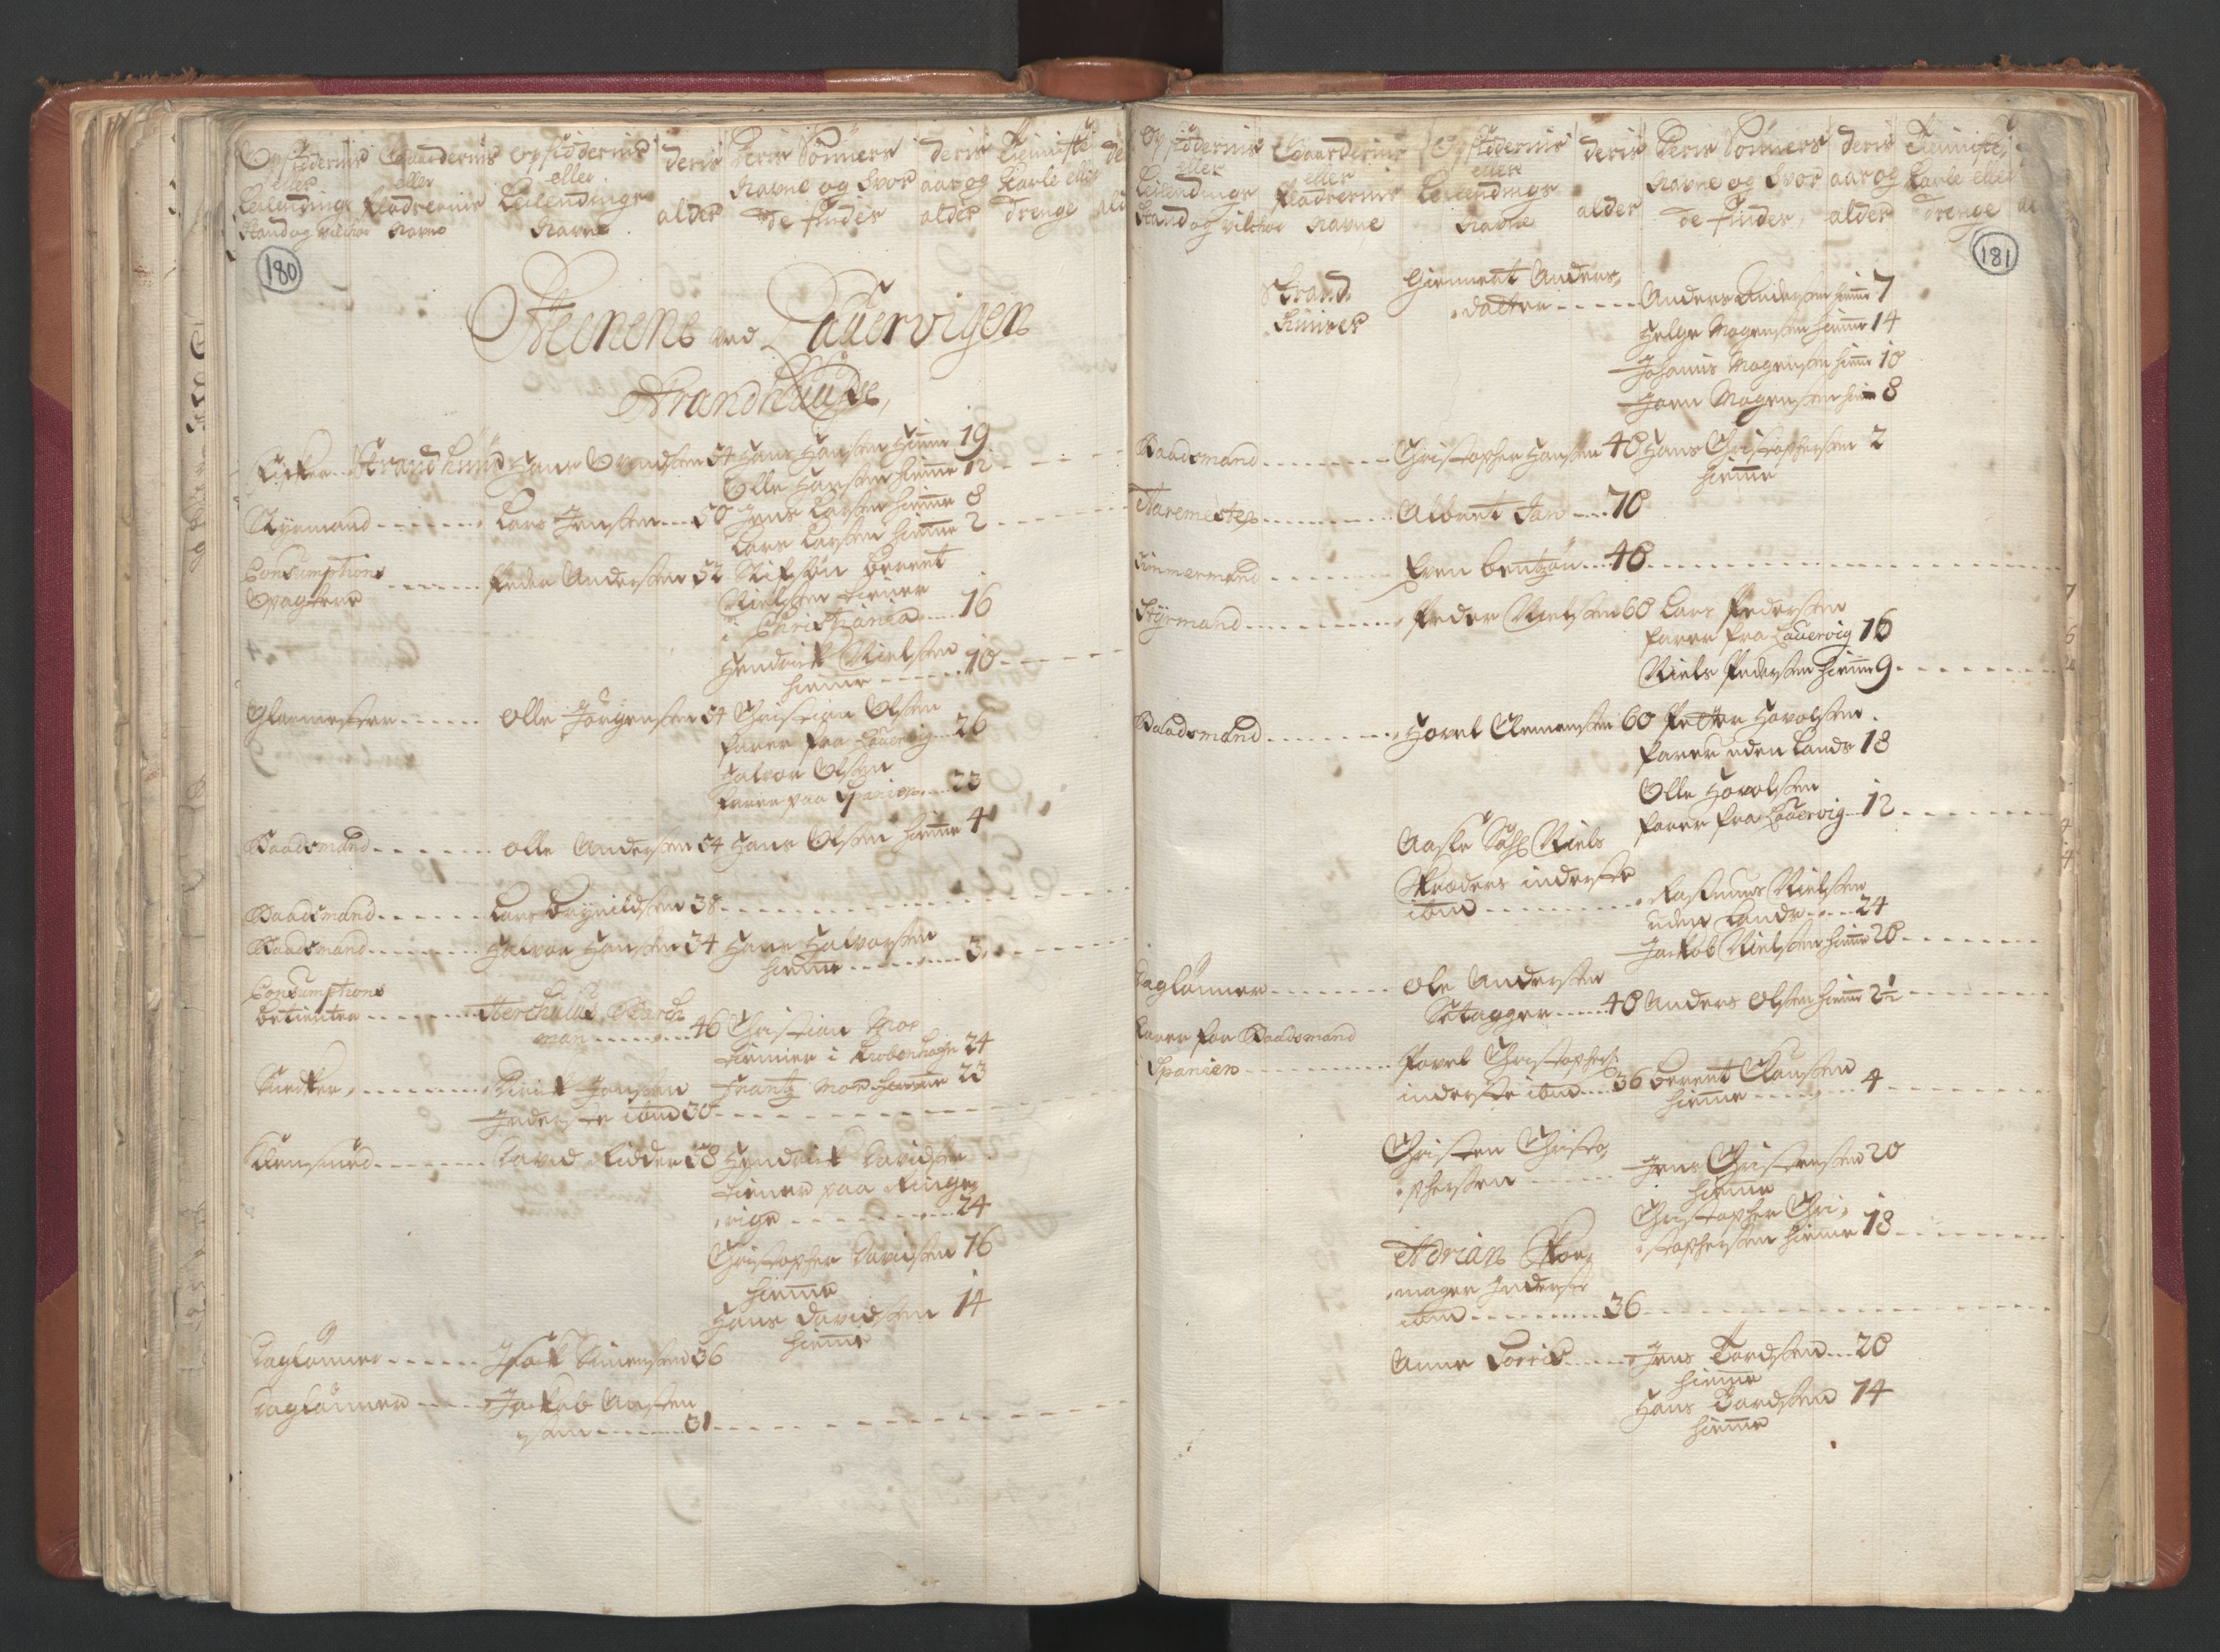 RA, Manntallet 1701, nr. 2: Solør, Odal og Østerdal fogderi og Larvik grevskap, 1701, s. 180-181